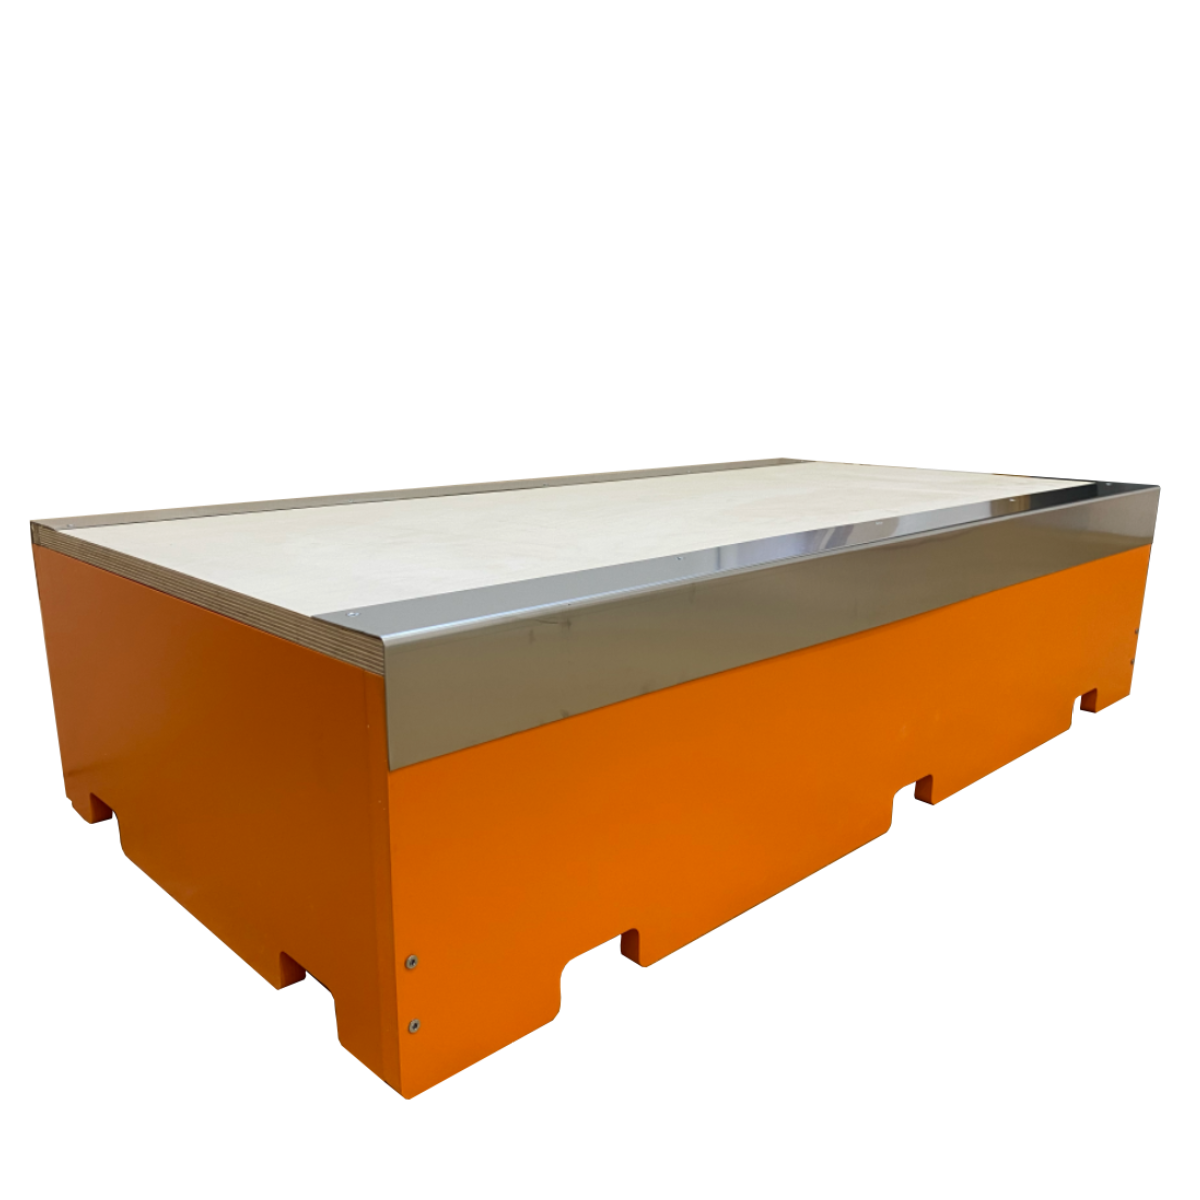 grind-box-1240x300-3